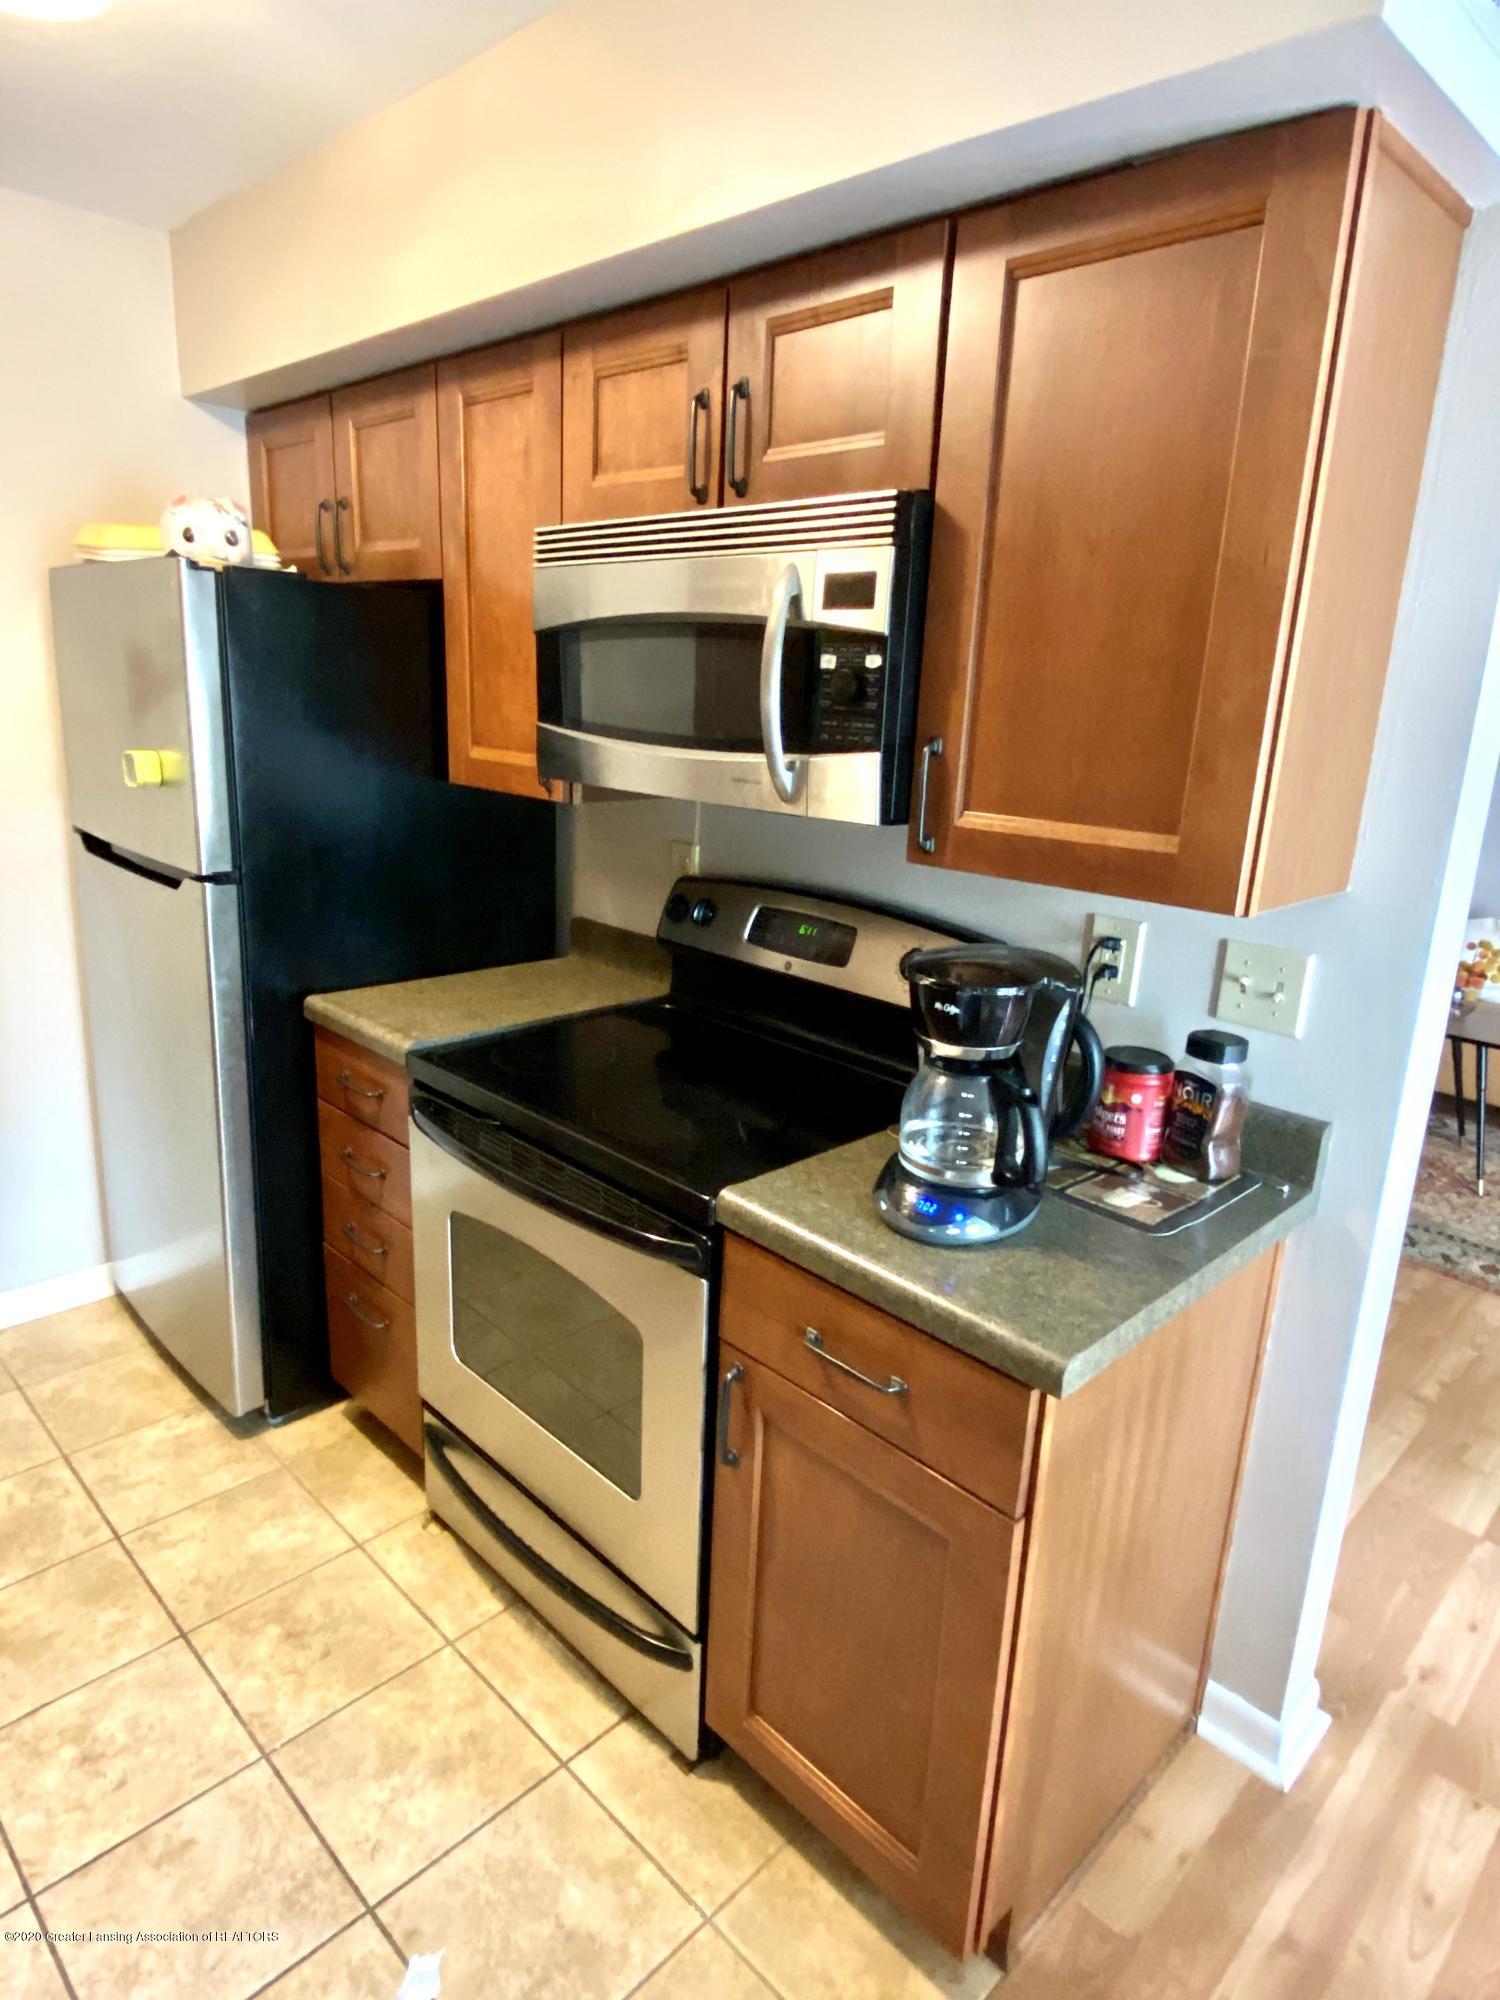 2024 Hamilton Rd 204 - Newer Kitchen - Appliances stay - 5